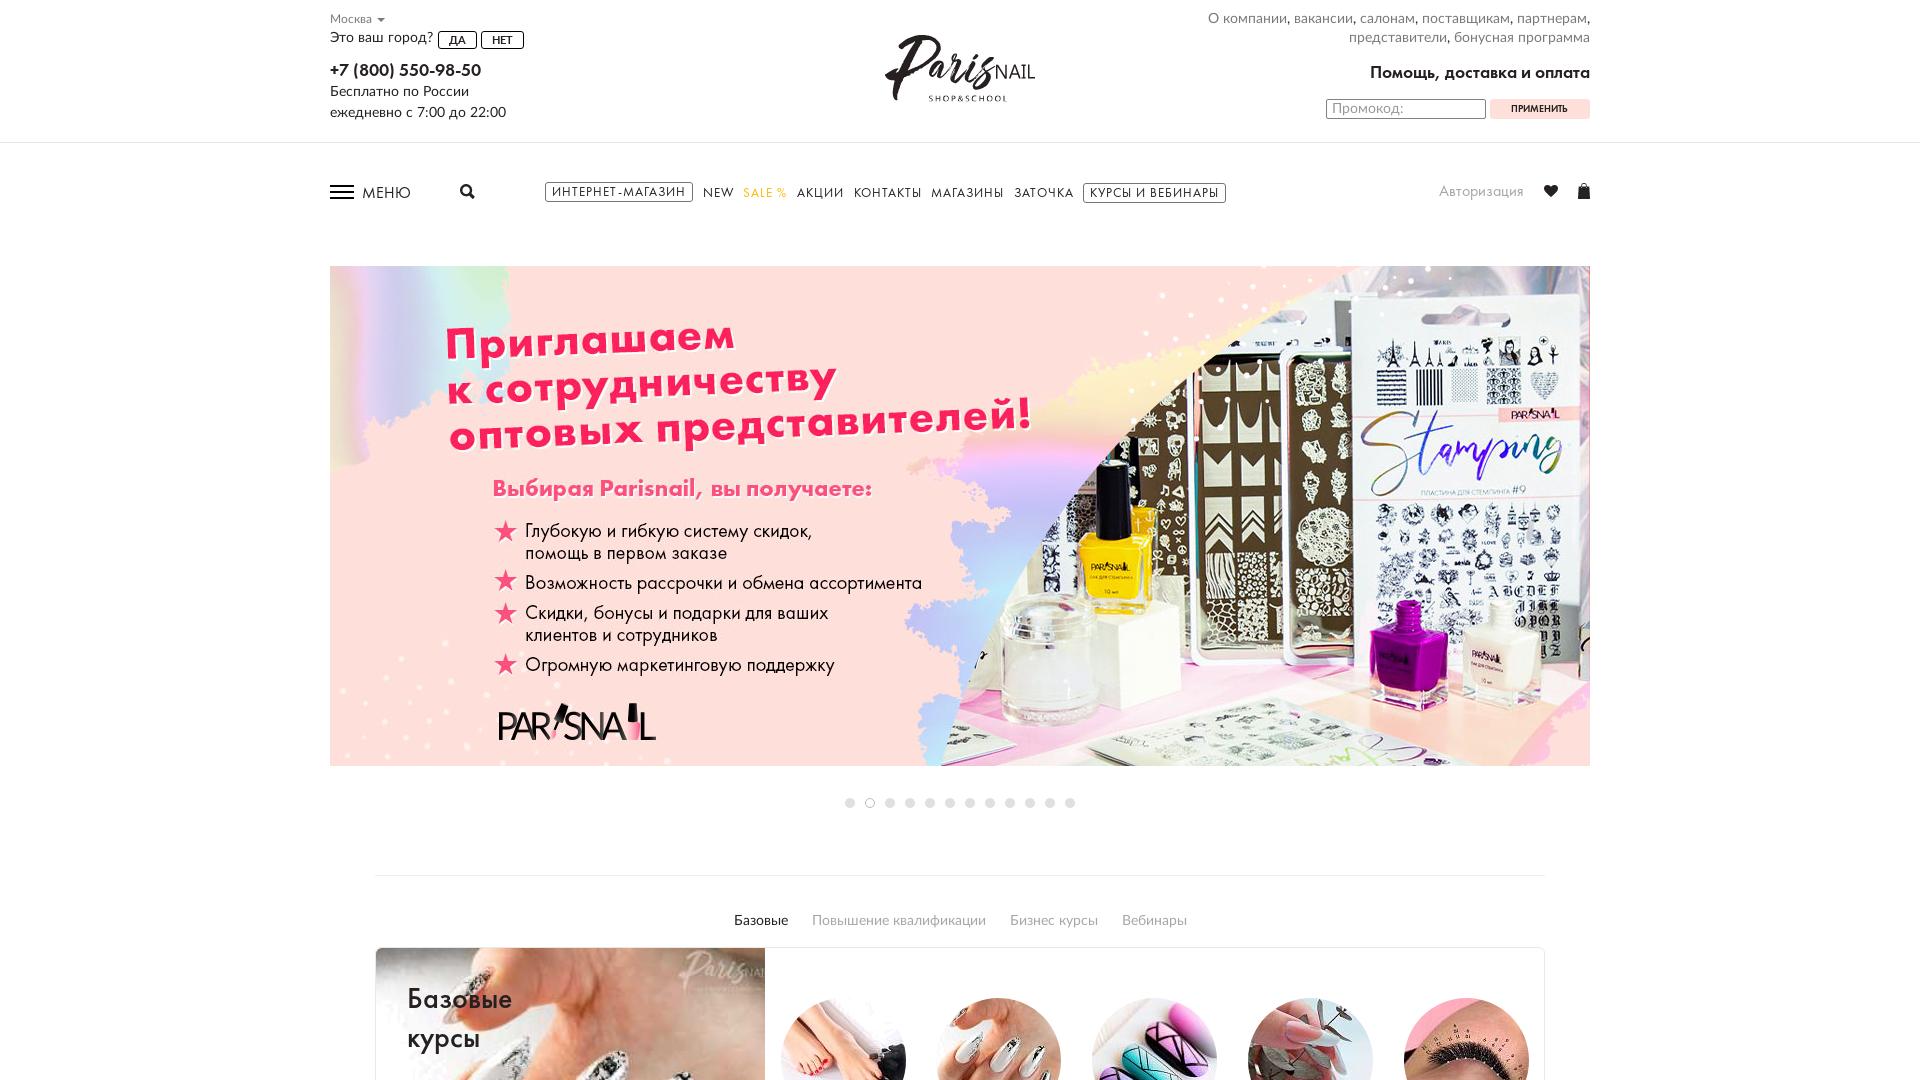 parisnail website